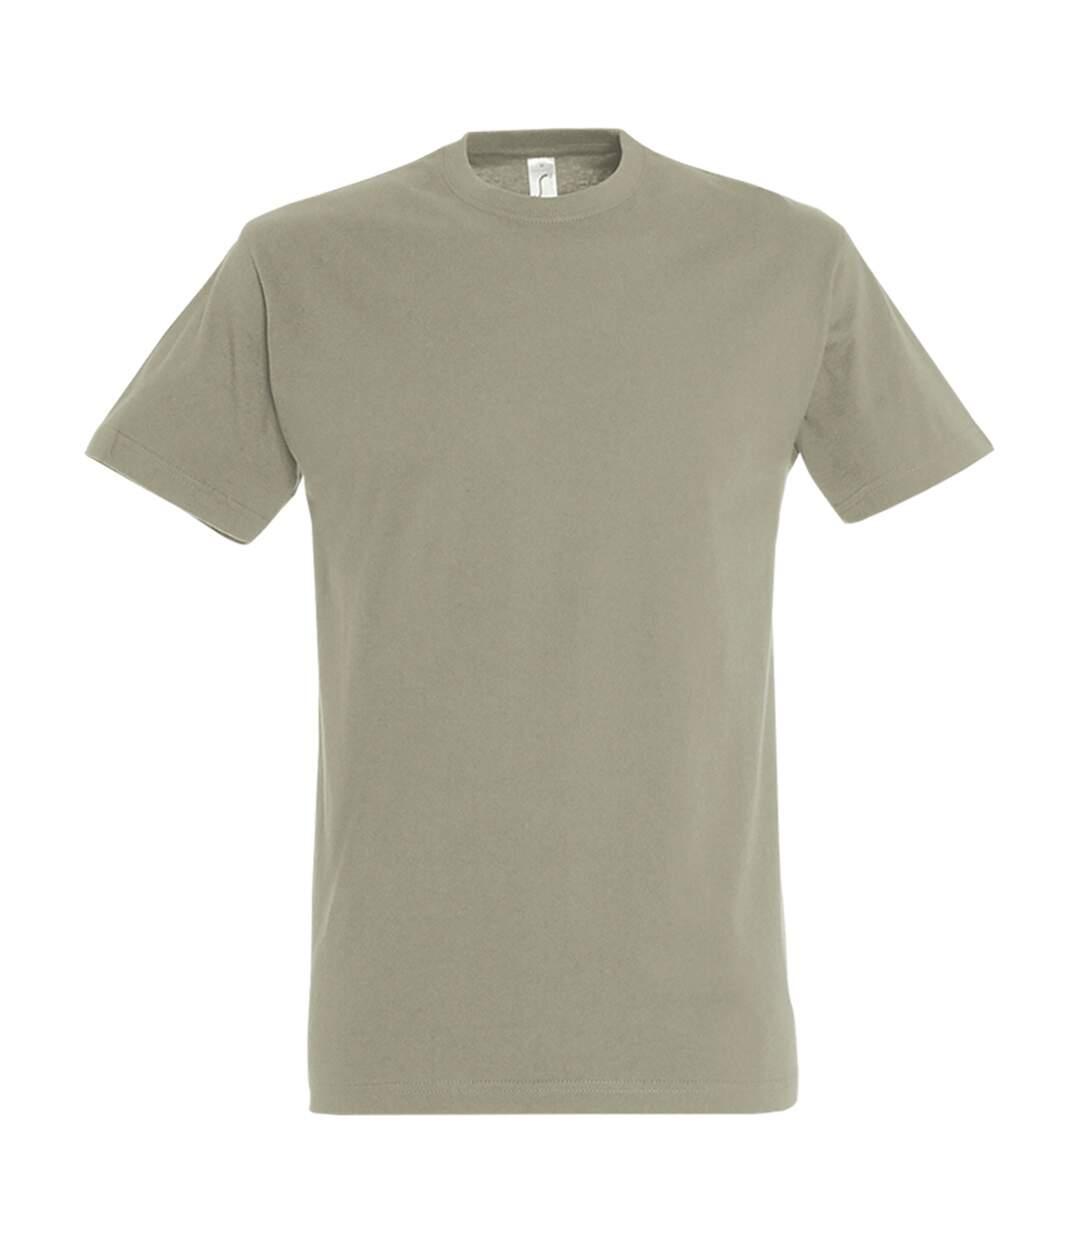 SOLS Mens Imperial Heavyweight Short Sleeve T-Shirt (Khaki) - UTPC290